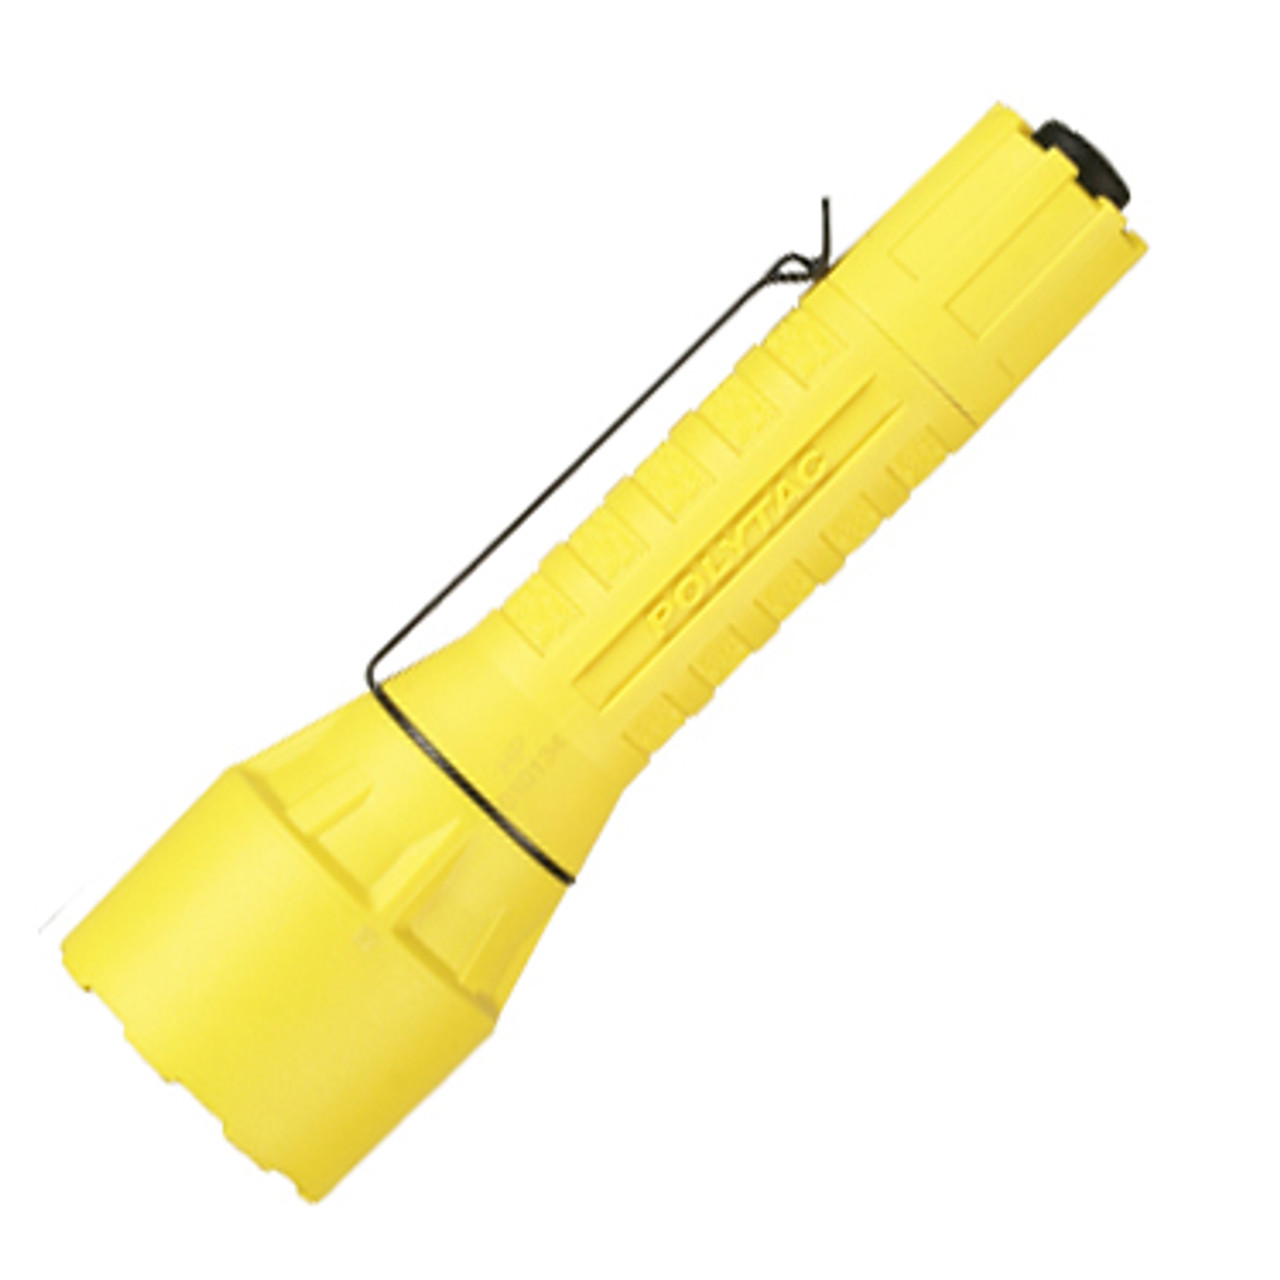 Streamlight PolyTac HP Down Range Polymer Flashlight 88863, C4 LED Light, 600 Max Lumens, Yellow